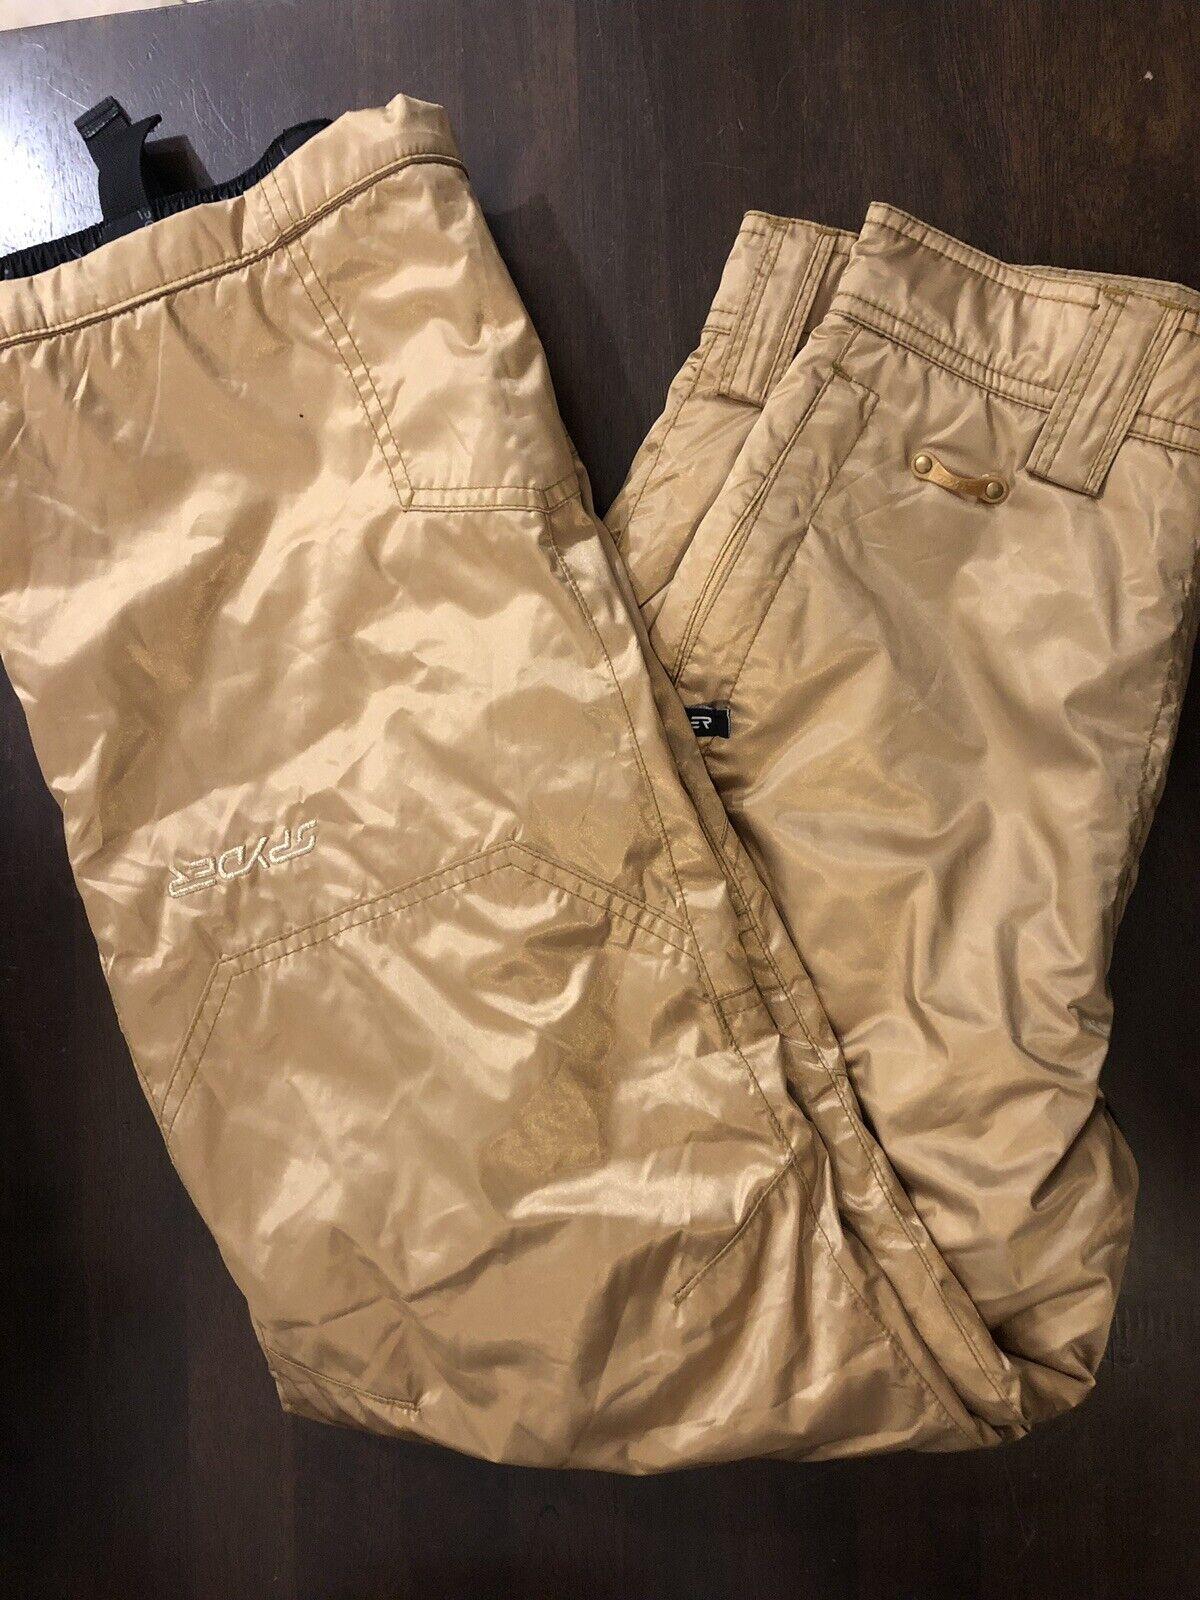 Spyder NWOT Metallic Gold Snow Ski Snowboard Pants AWESOME Youth Größe 14